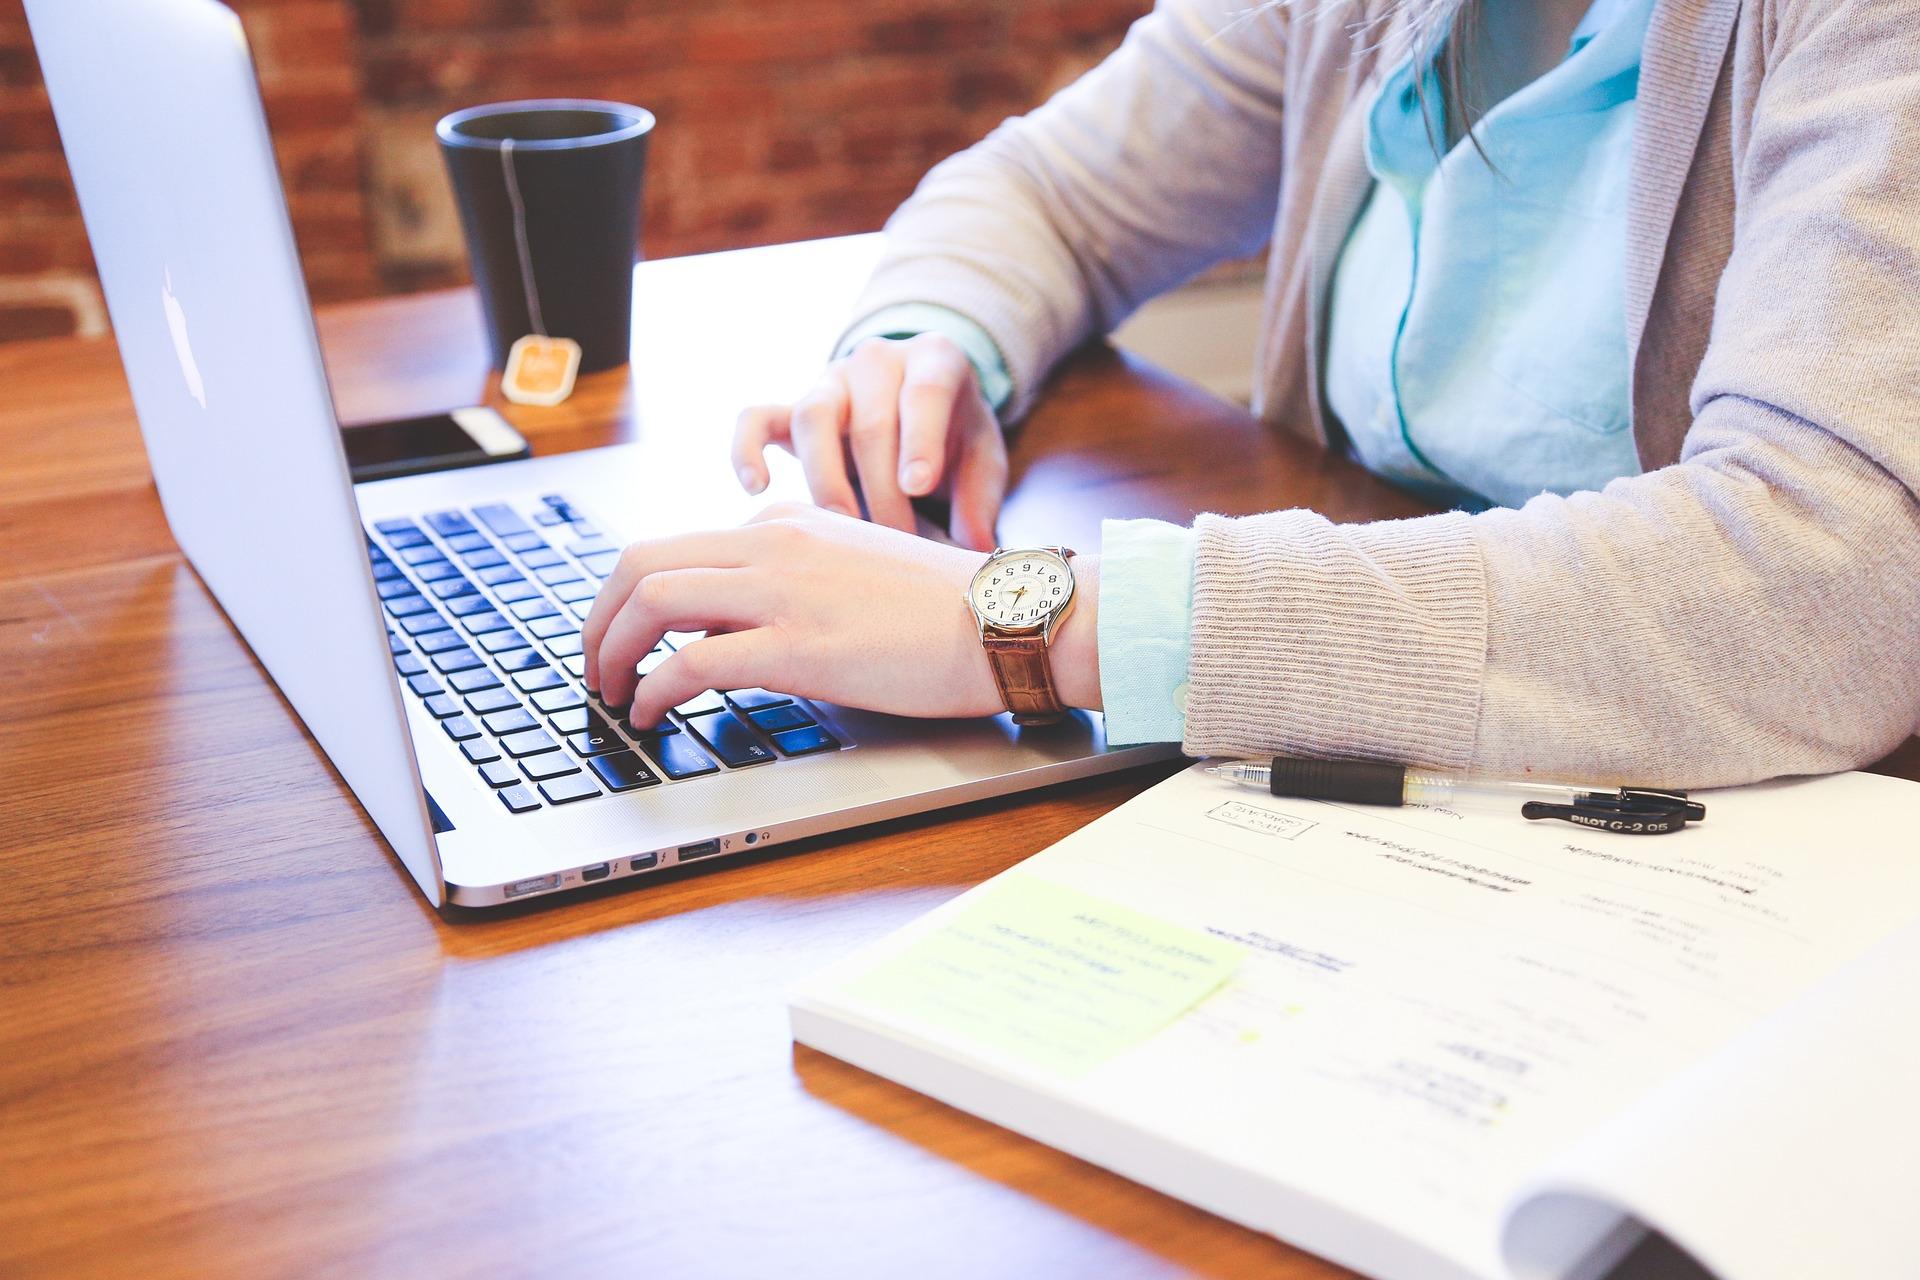 Cum se utilizeaza tehnologia pentru marketingul direct prin e-mail